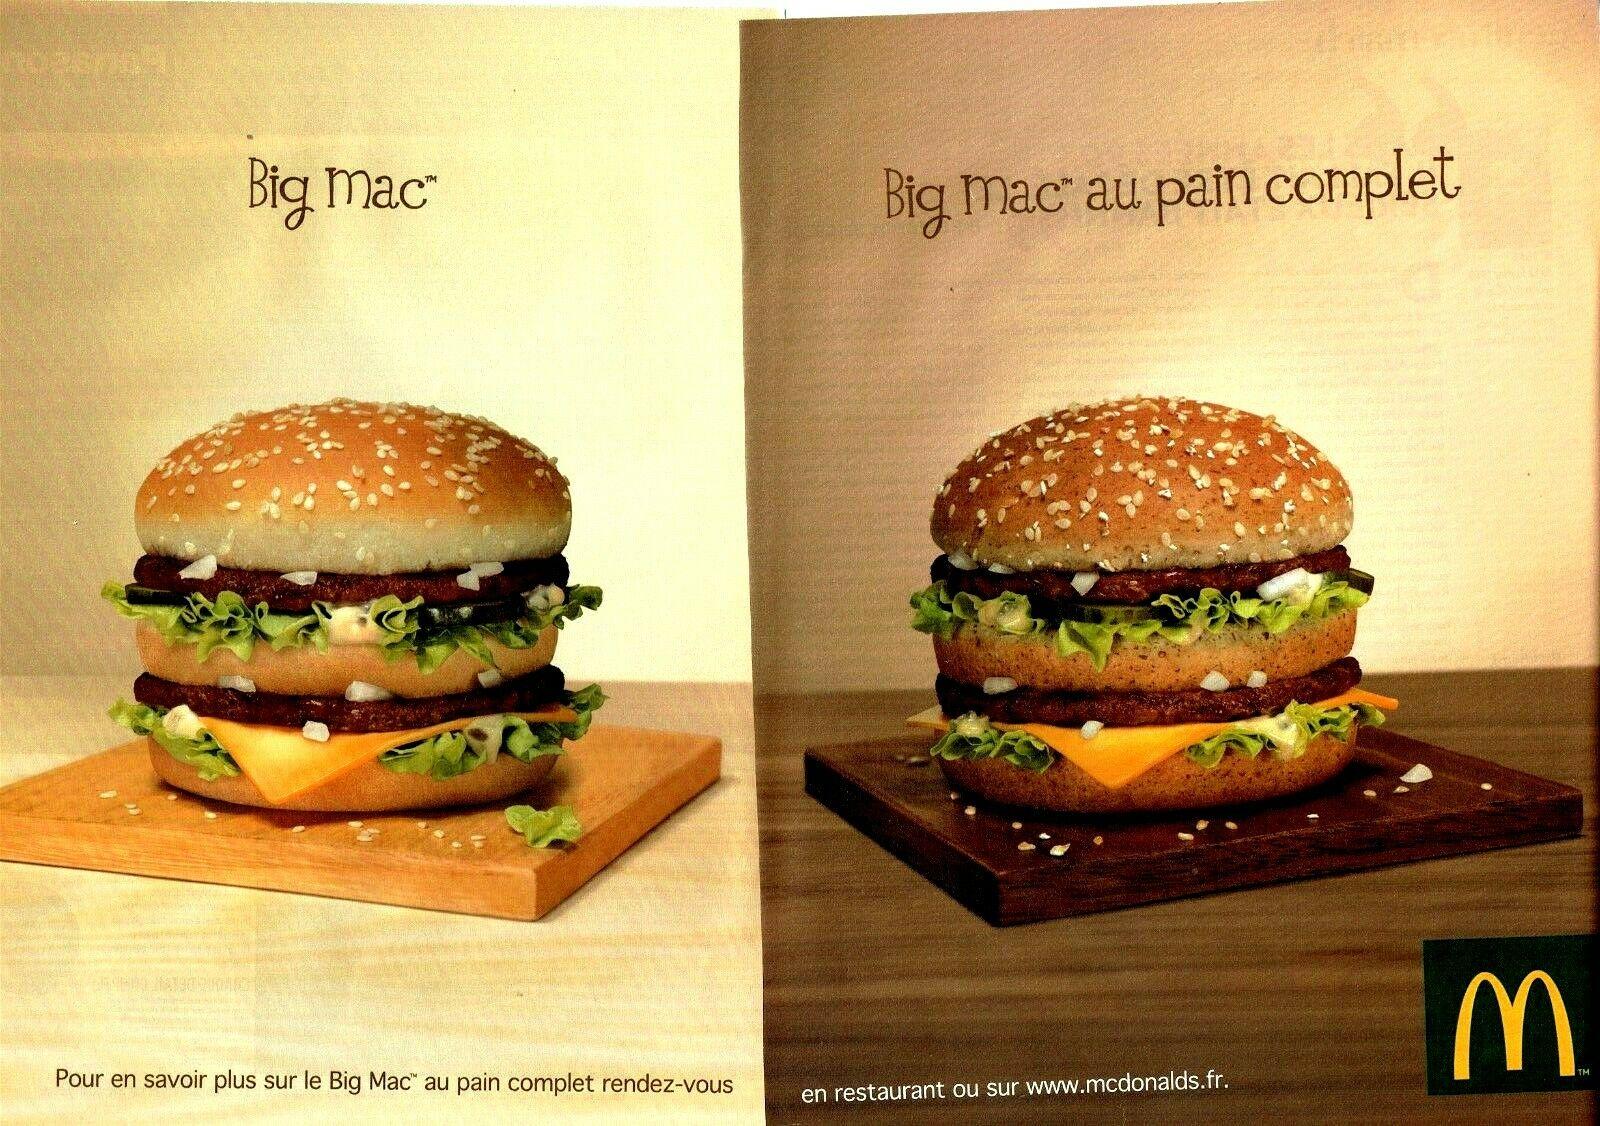 2009 McDonalds